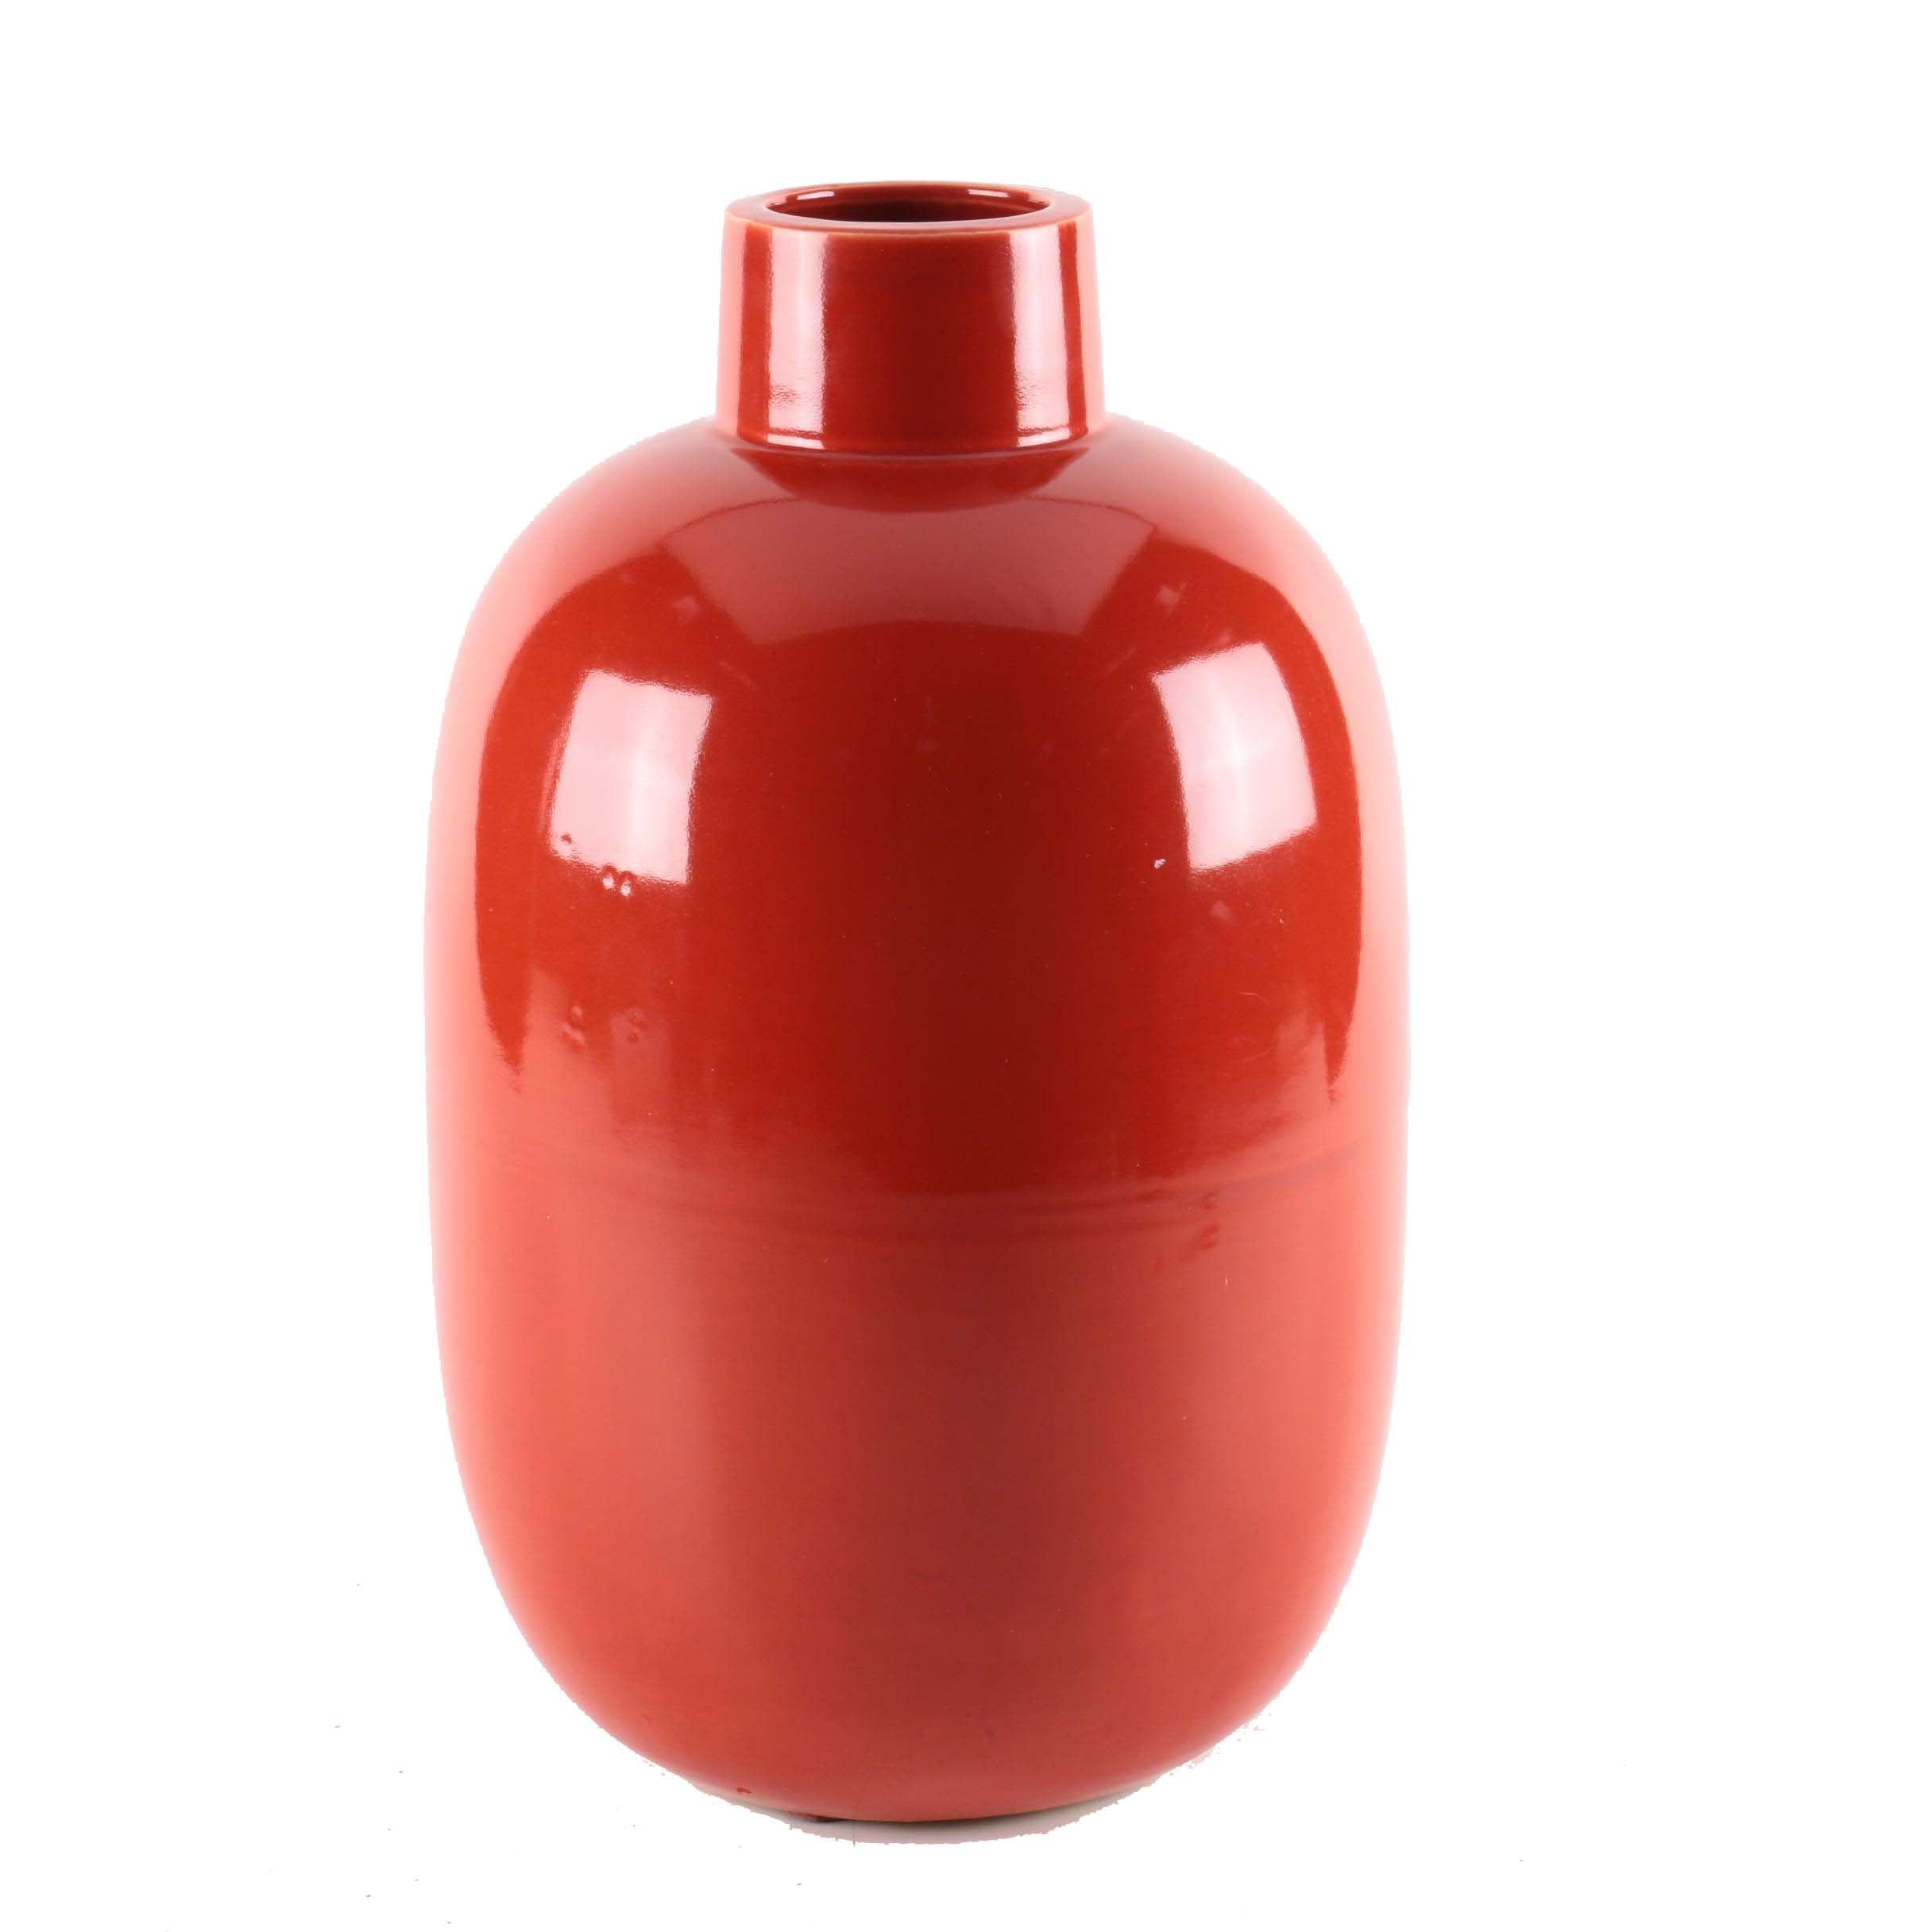 Mid Century Modern Style Ceramic Vase